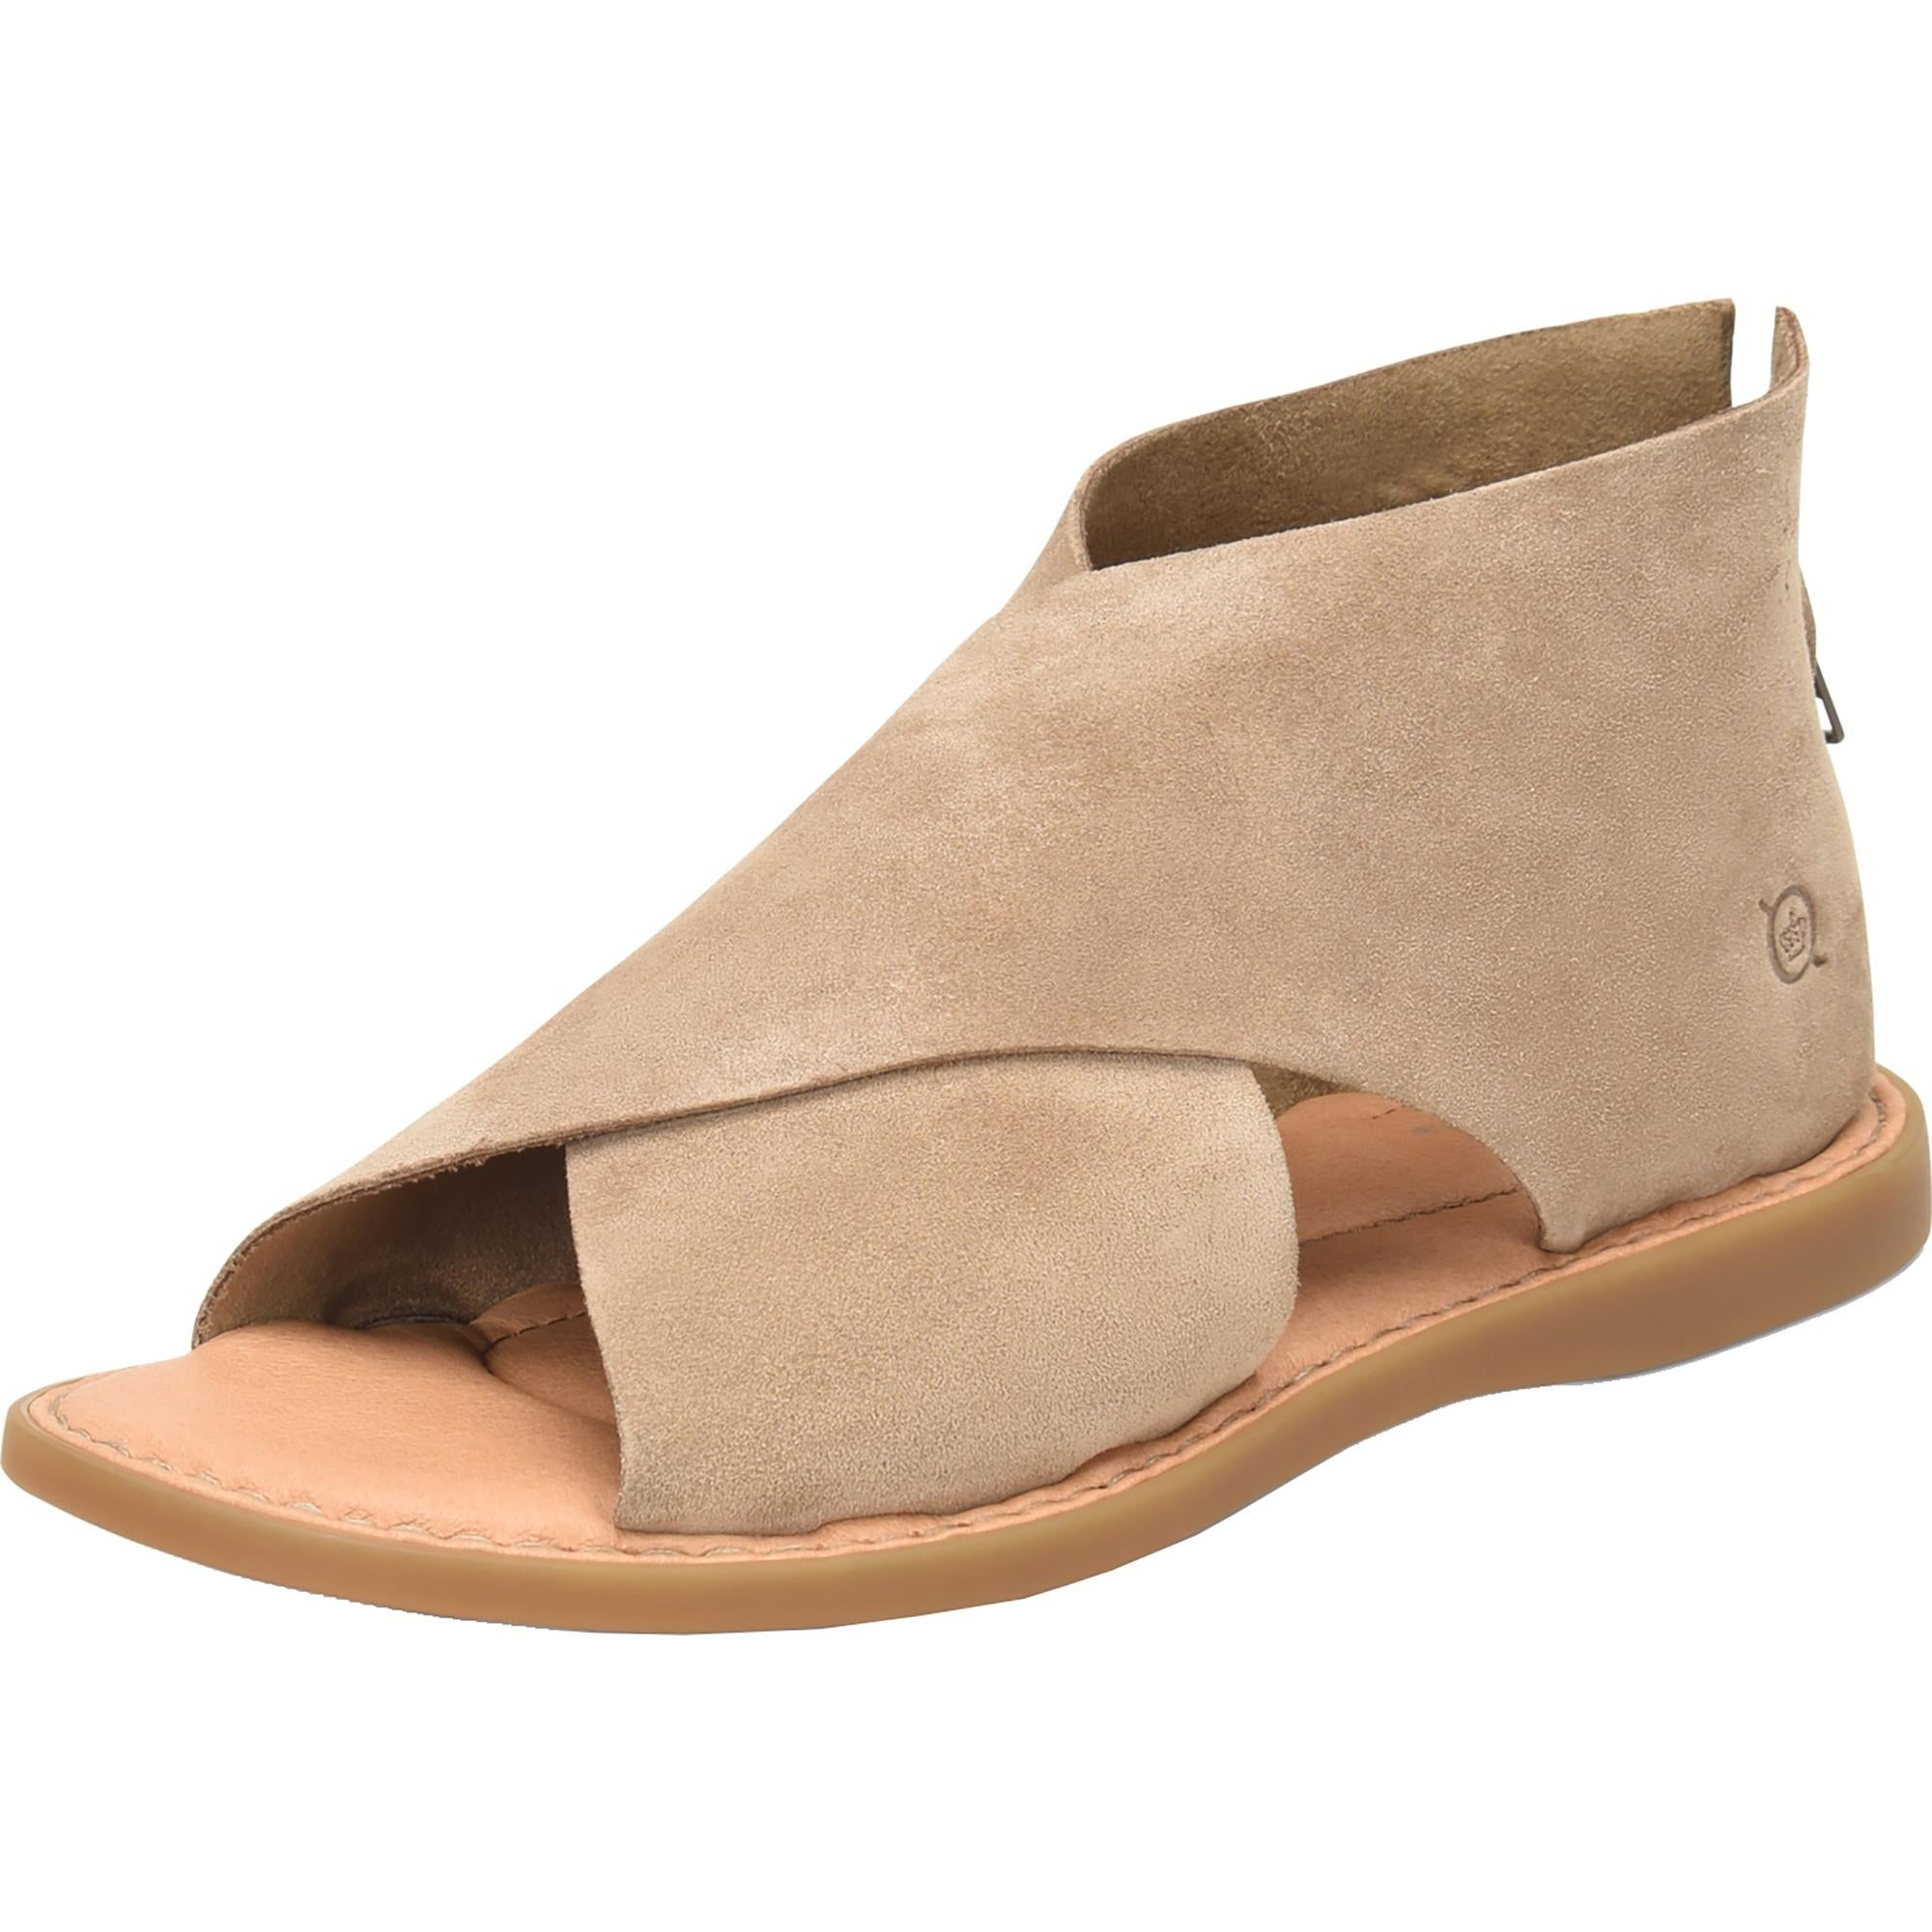 Shop Born Womens Iwa Flat Sandals Suede